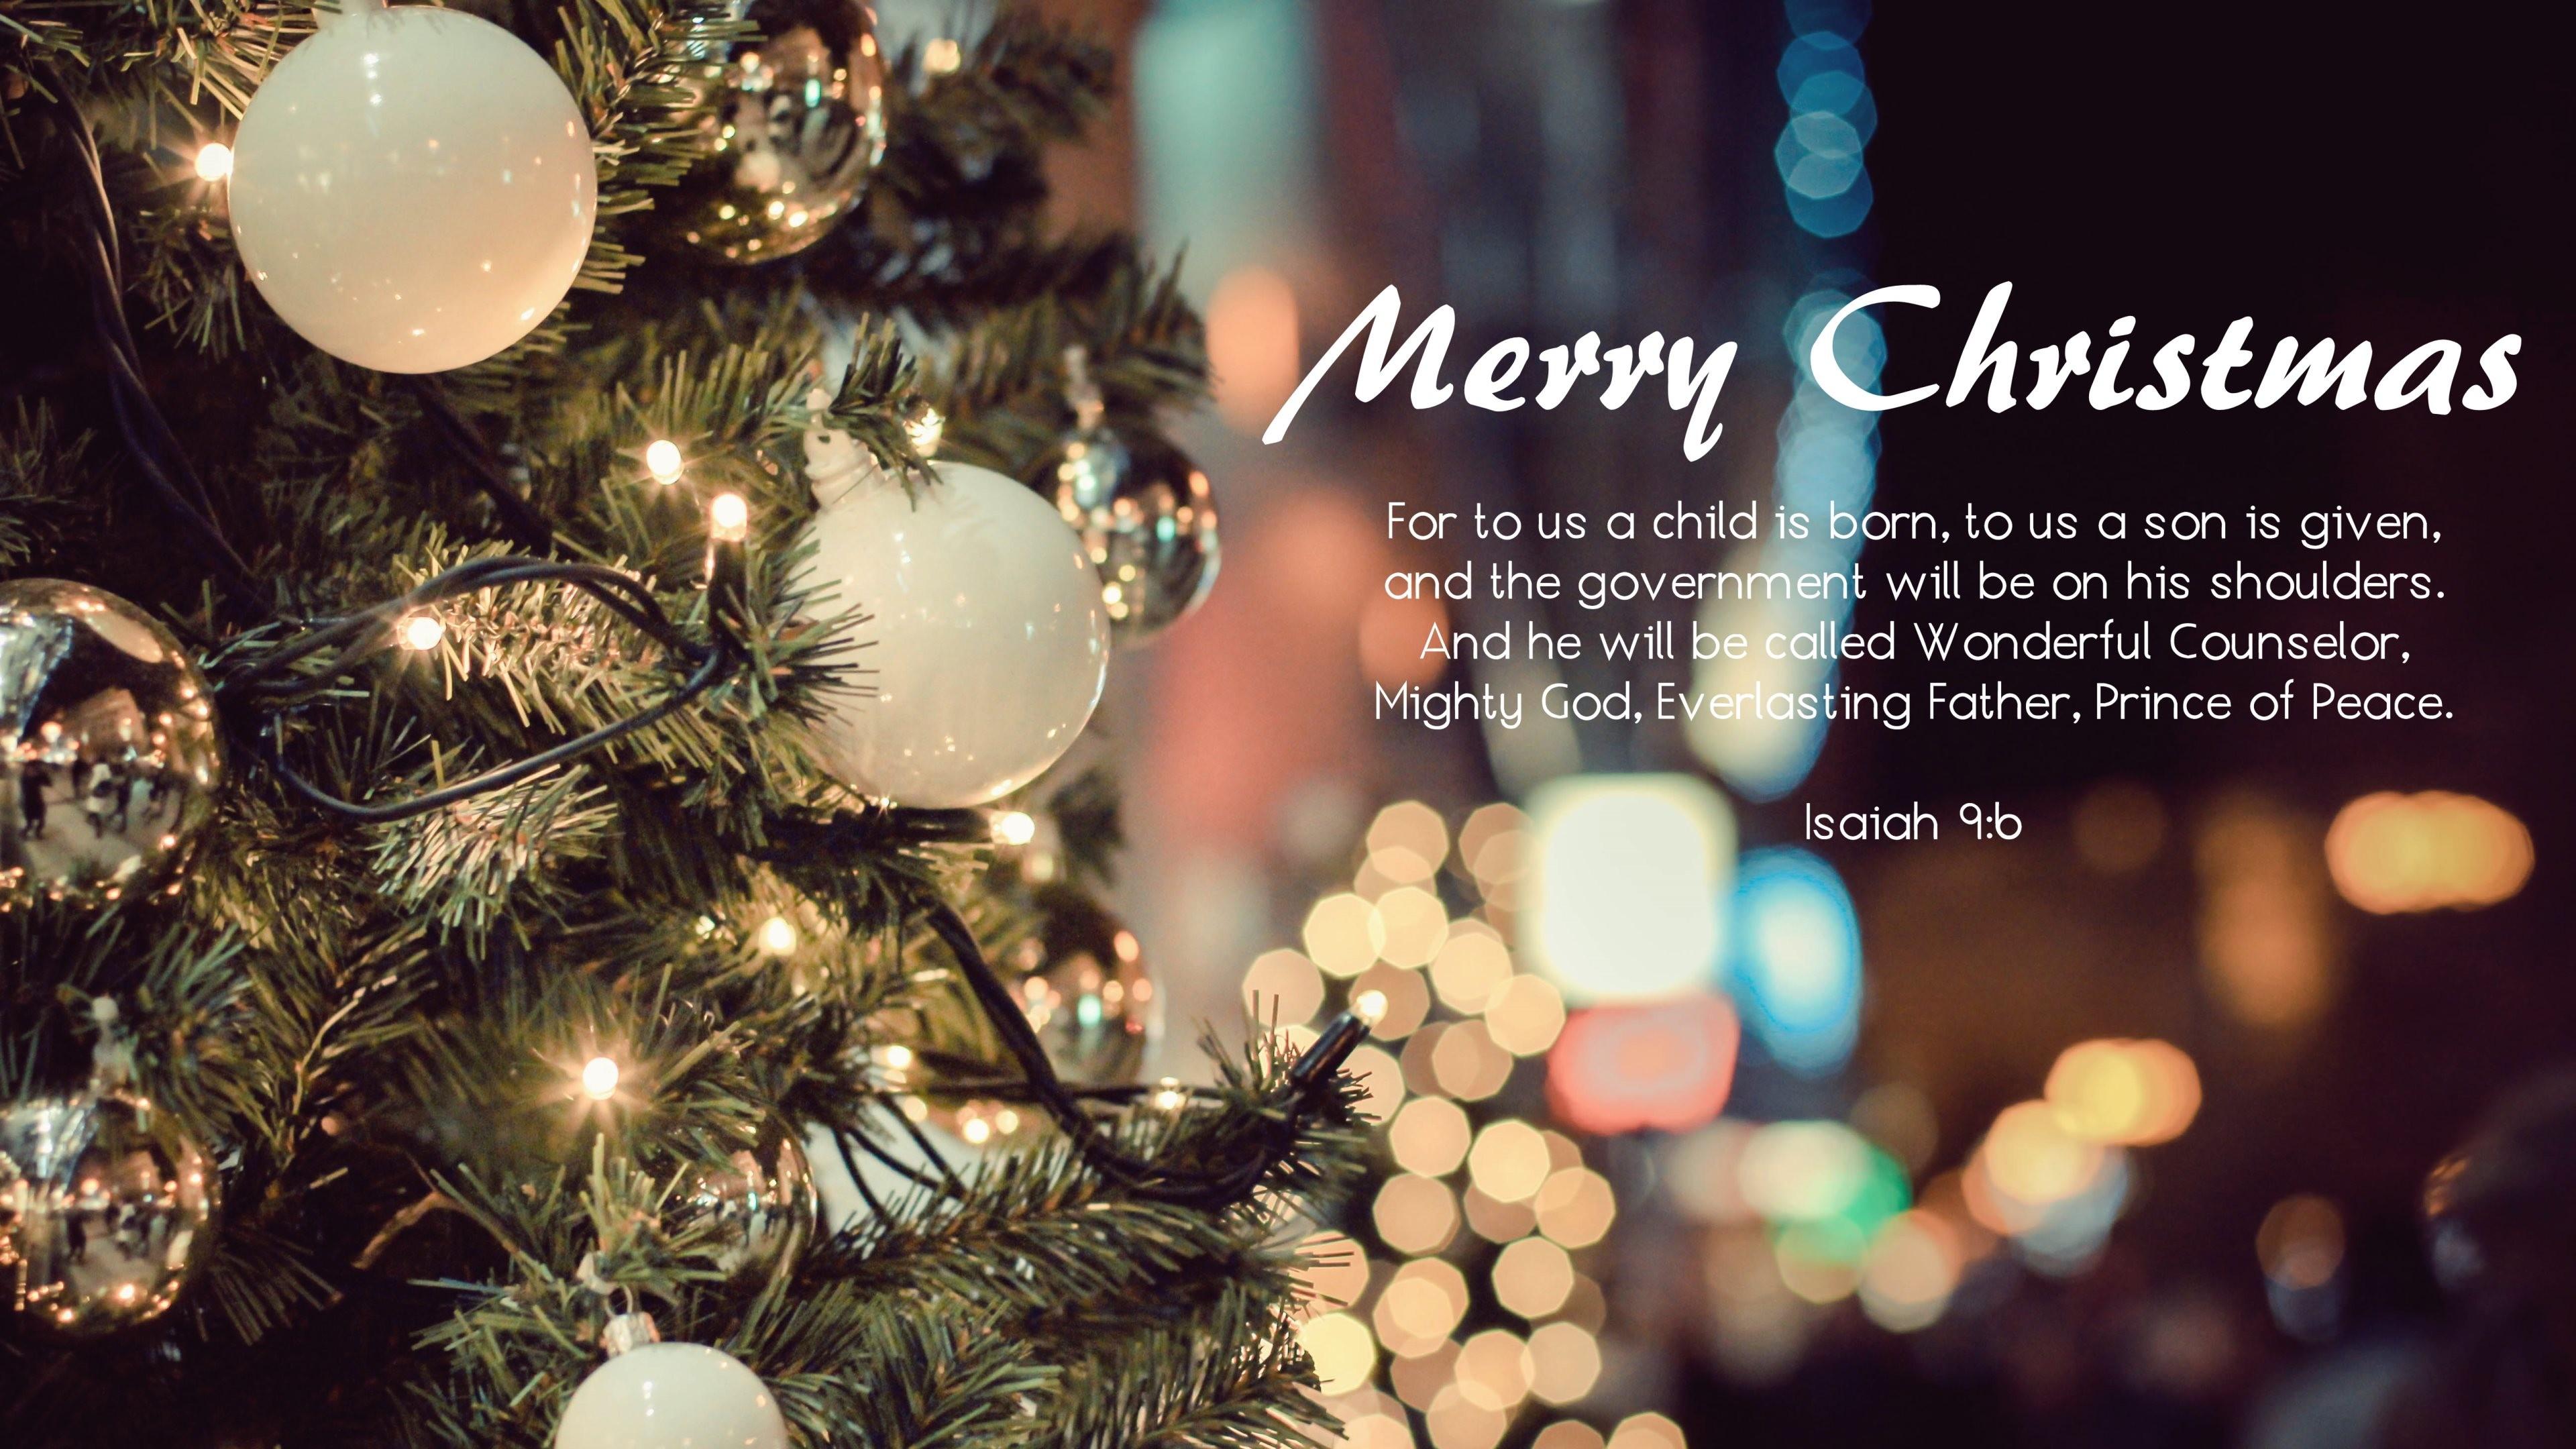 Wallpaper: Christmas Greetings. Ultra HD 4K 3840×2160